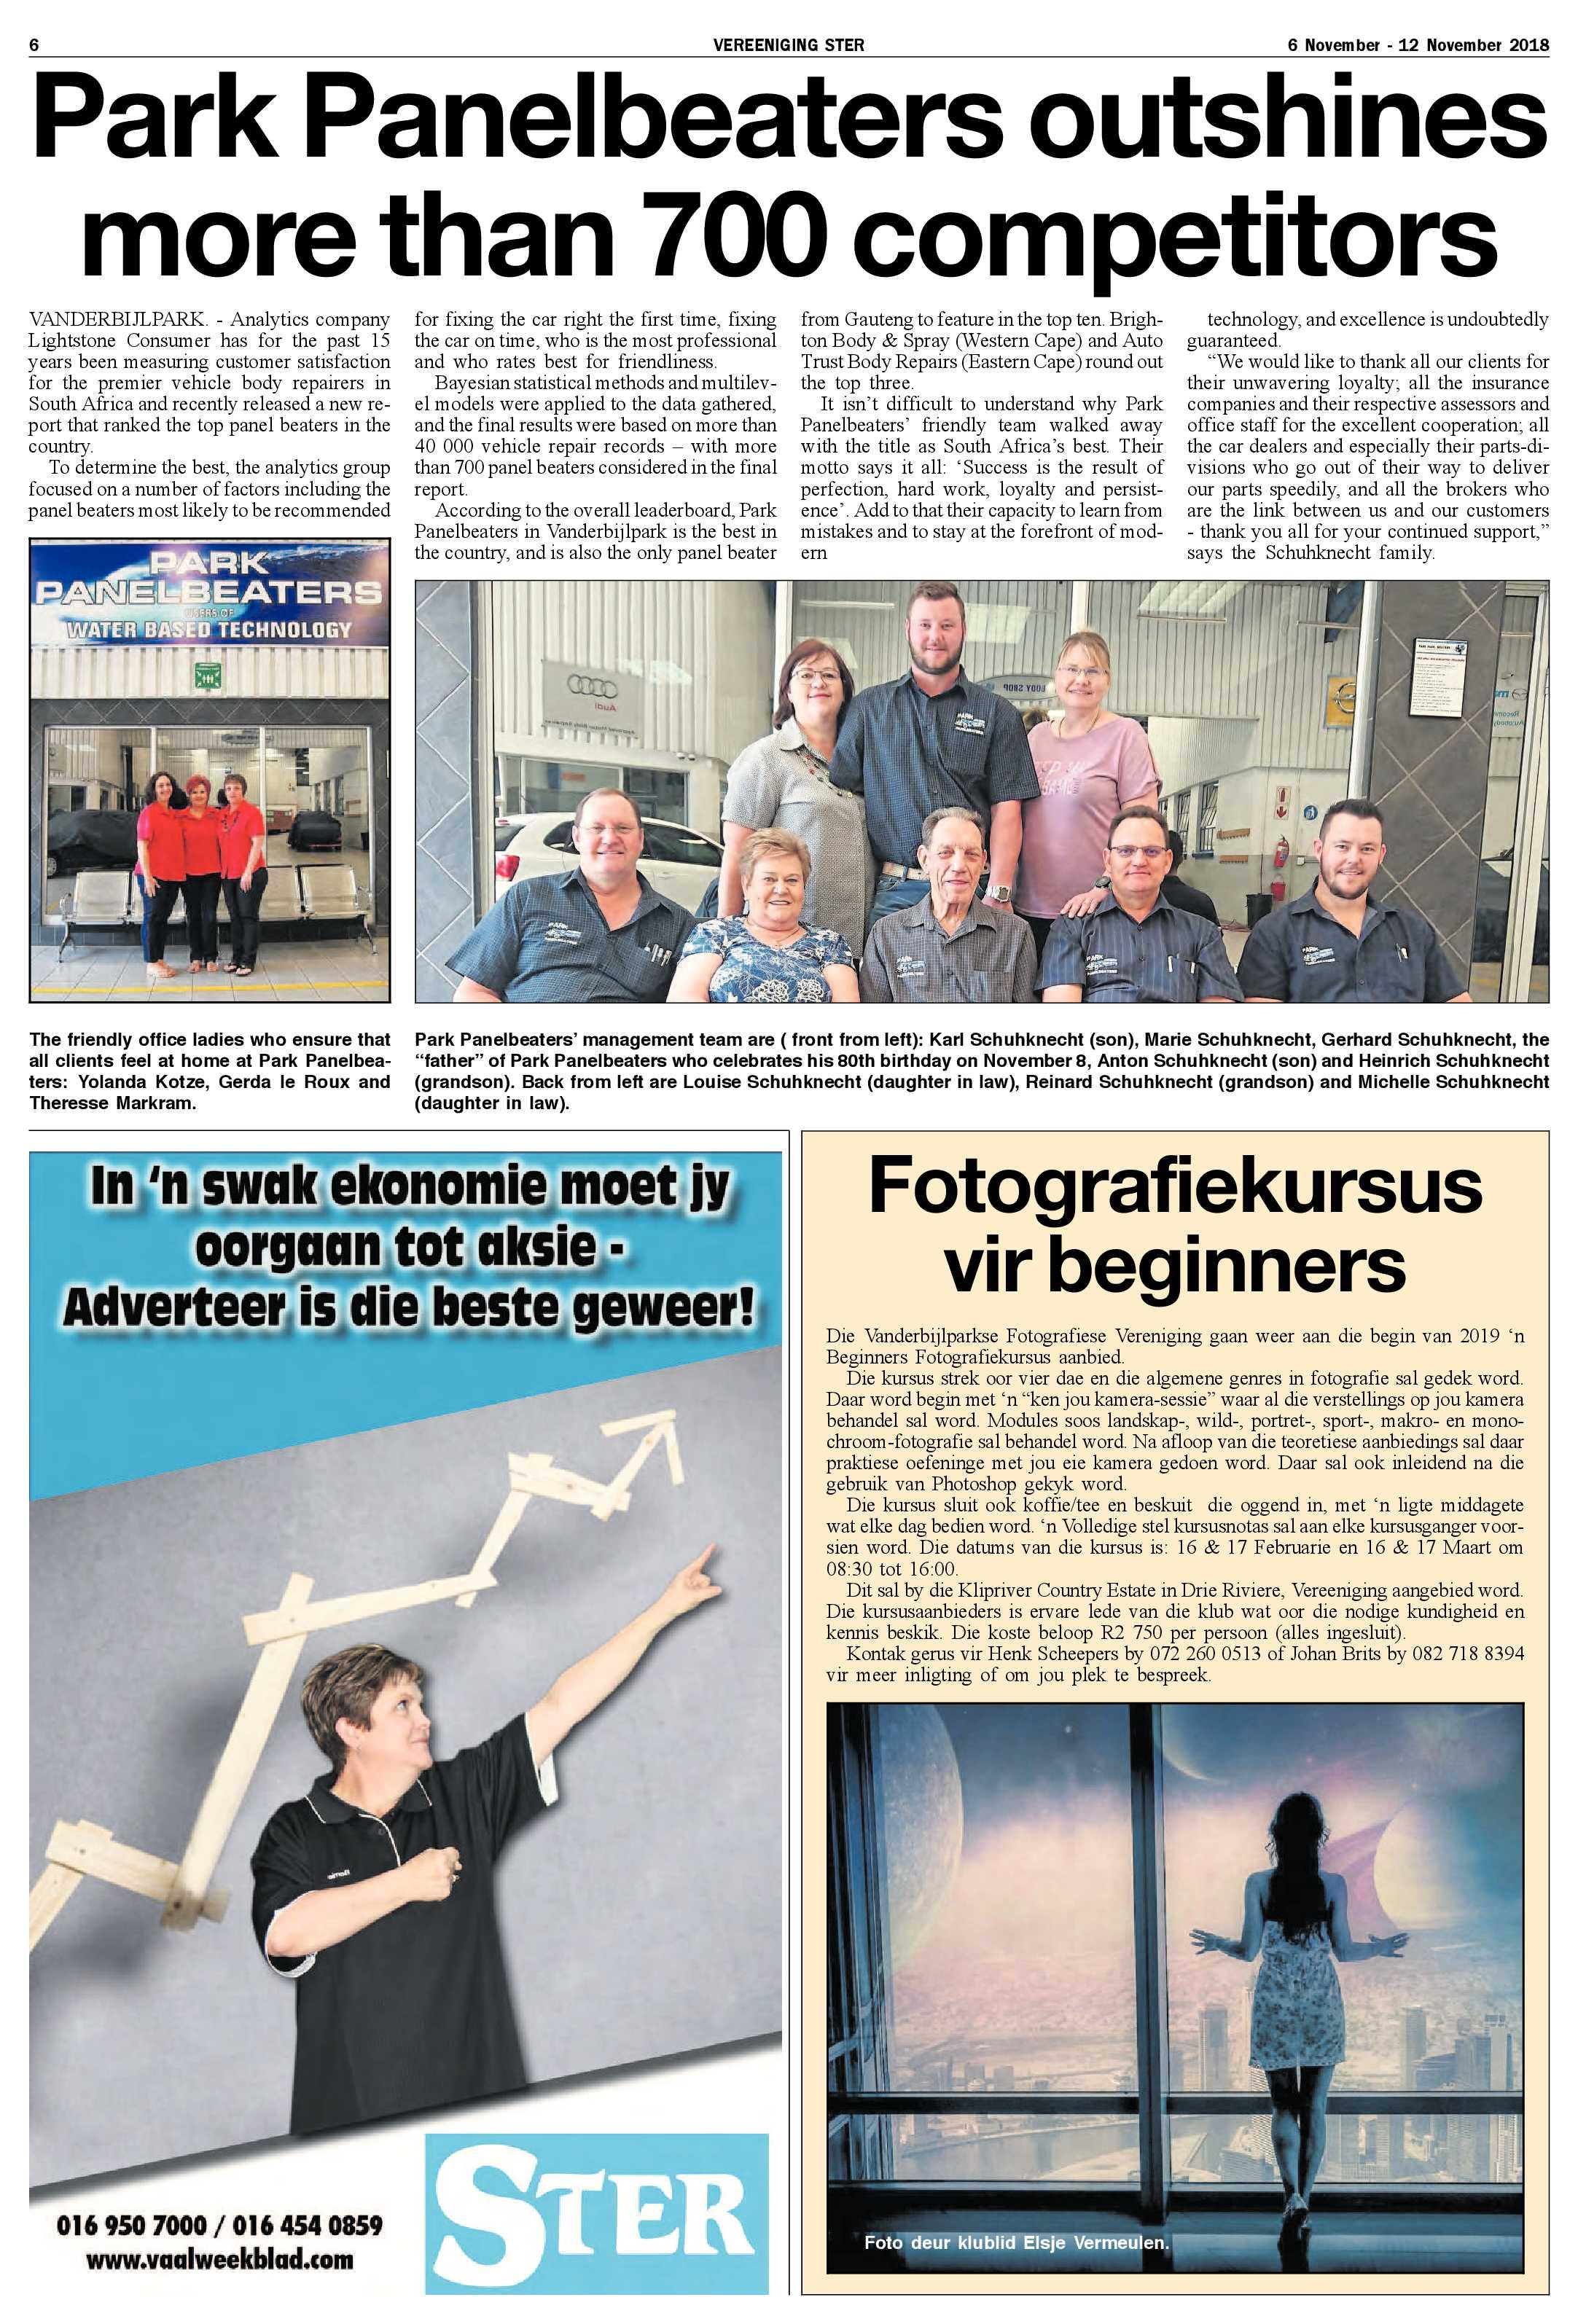 vereeniging-ster-6-12-november-2018-epapers-page-6